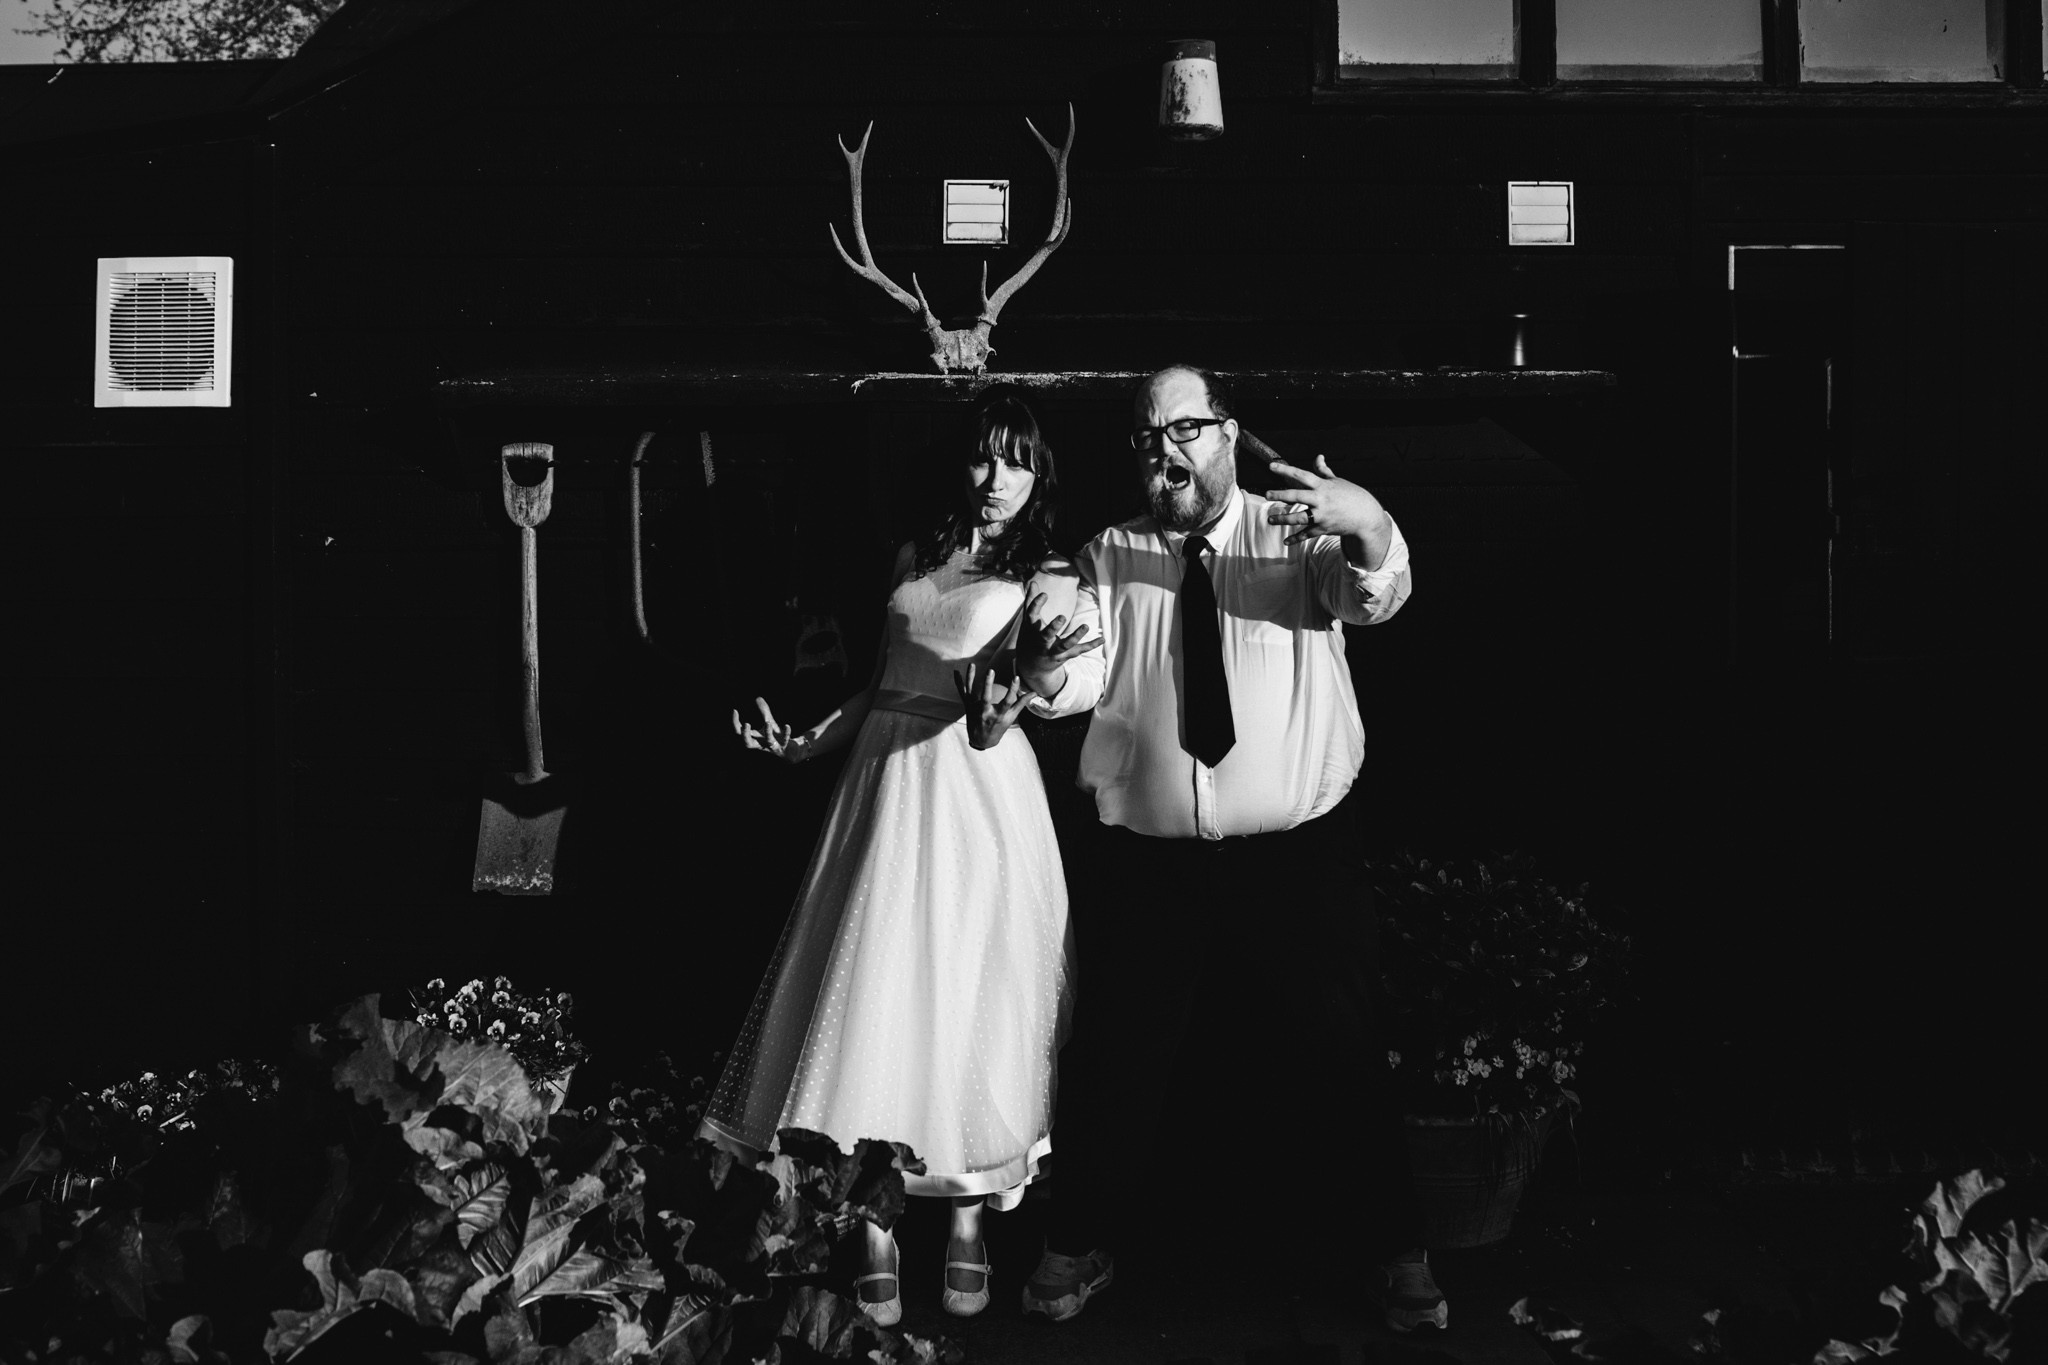 derbyshire-wedding-photographer-videographer-camera-hannah-81.jpg